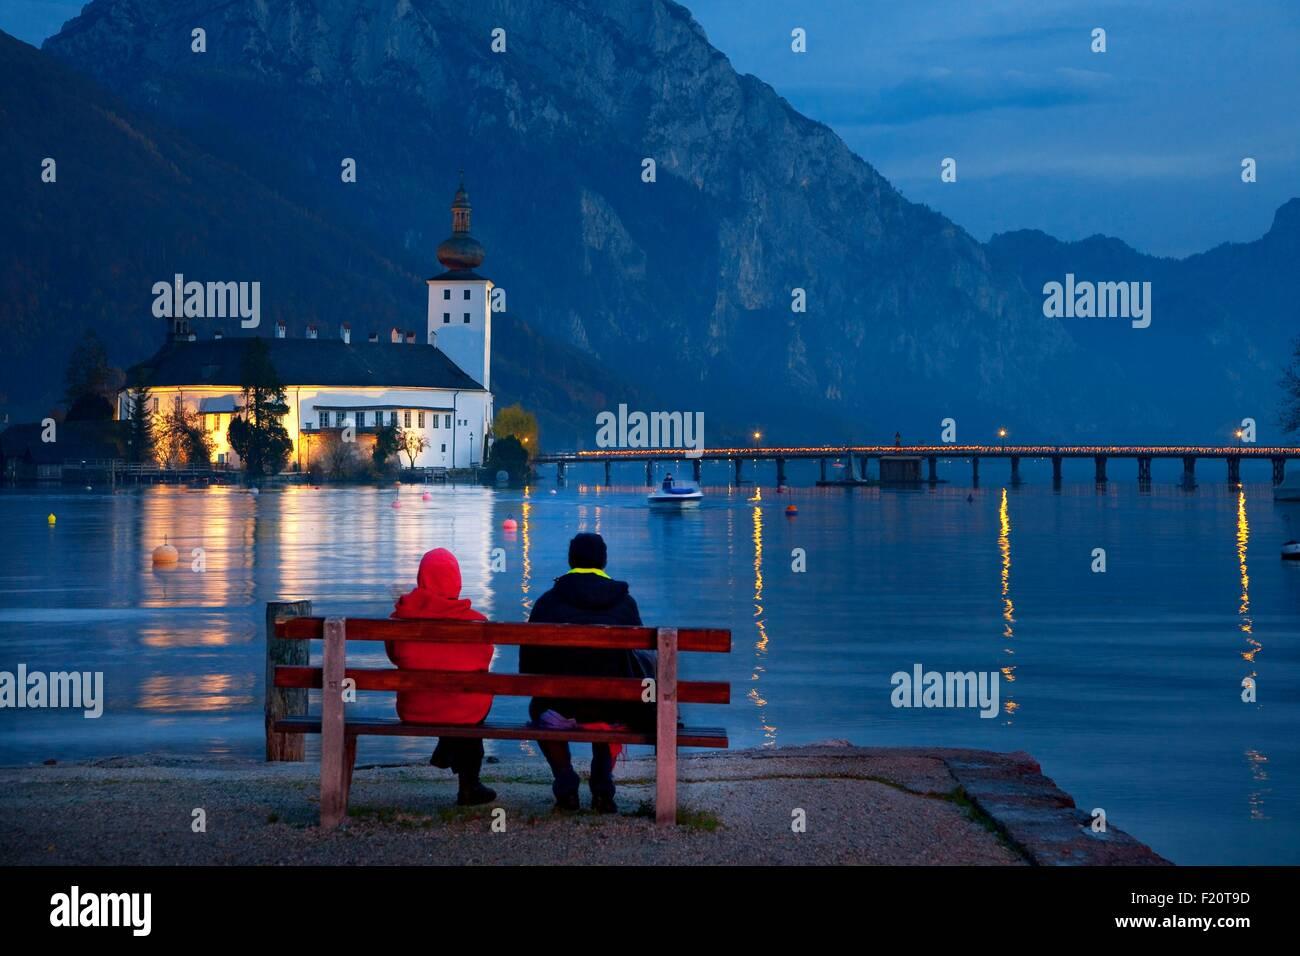 Austria, Upper Austria, Traunsee Lake, Gmunden, Ort Castle - Stock Image